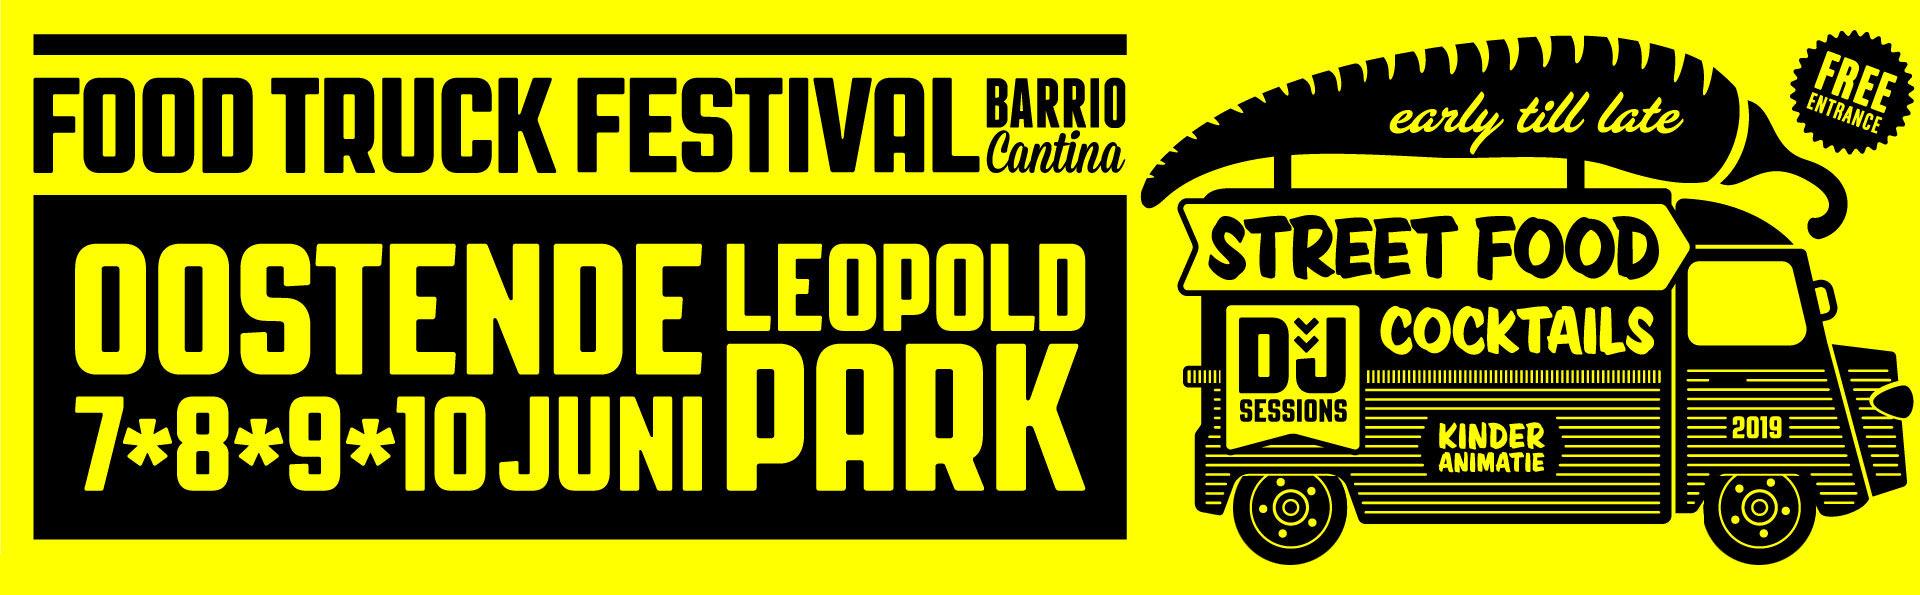 Barrio Cantina Juni 2019 Oostende Leopoldpark